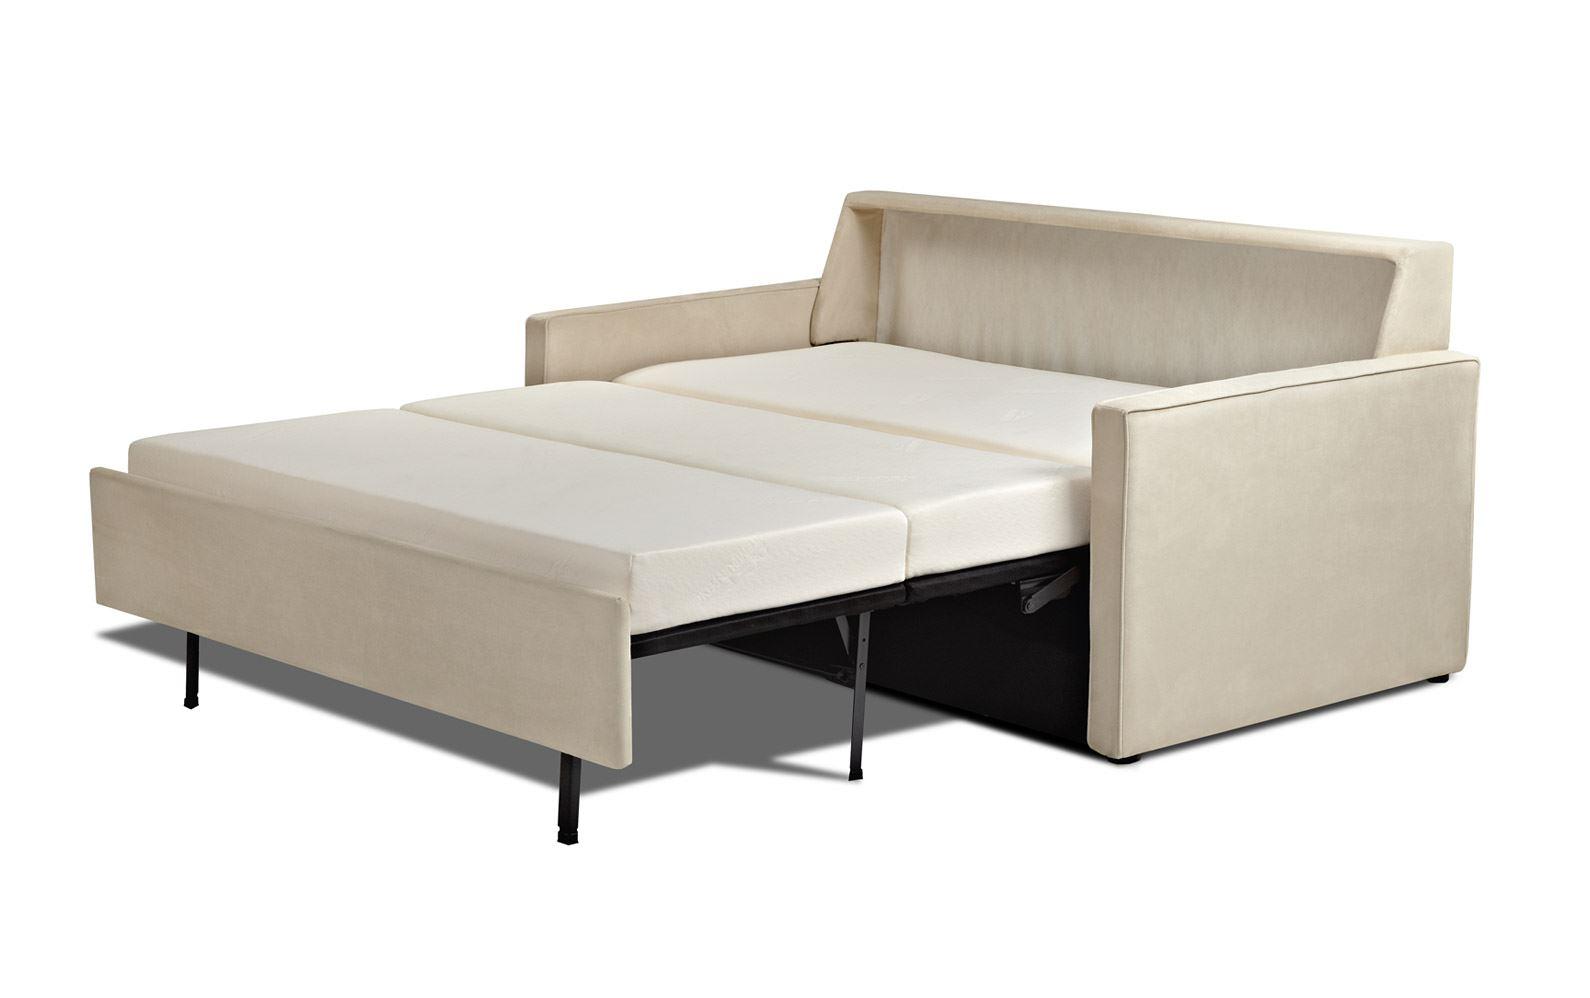 Posh Tempurpedic Sofa Bed Design For Fashionable